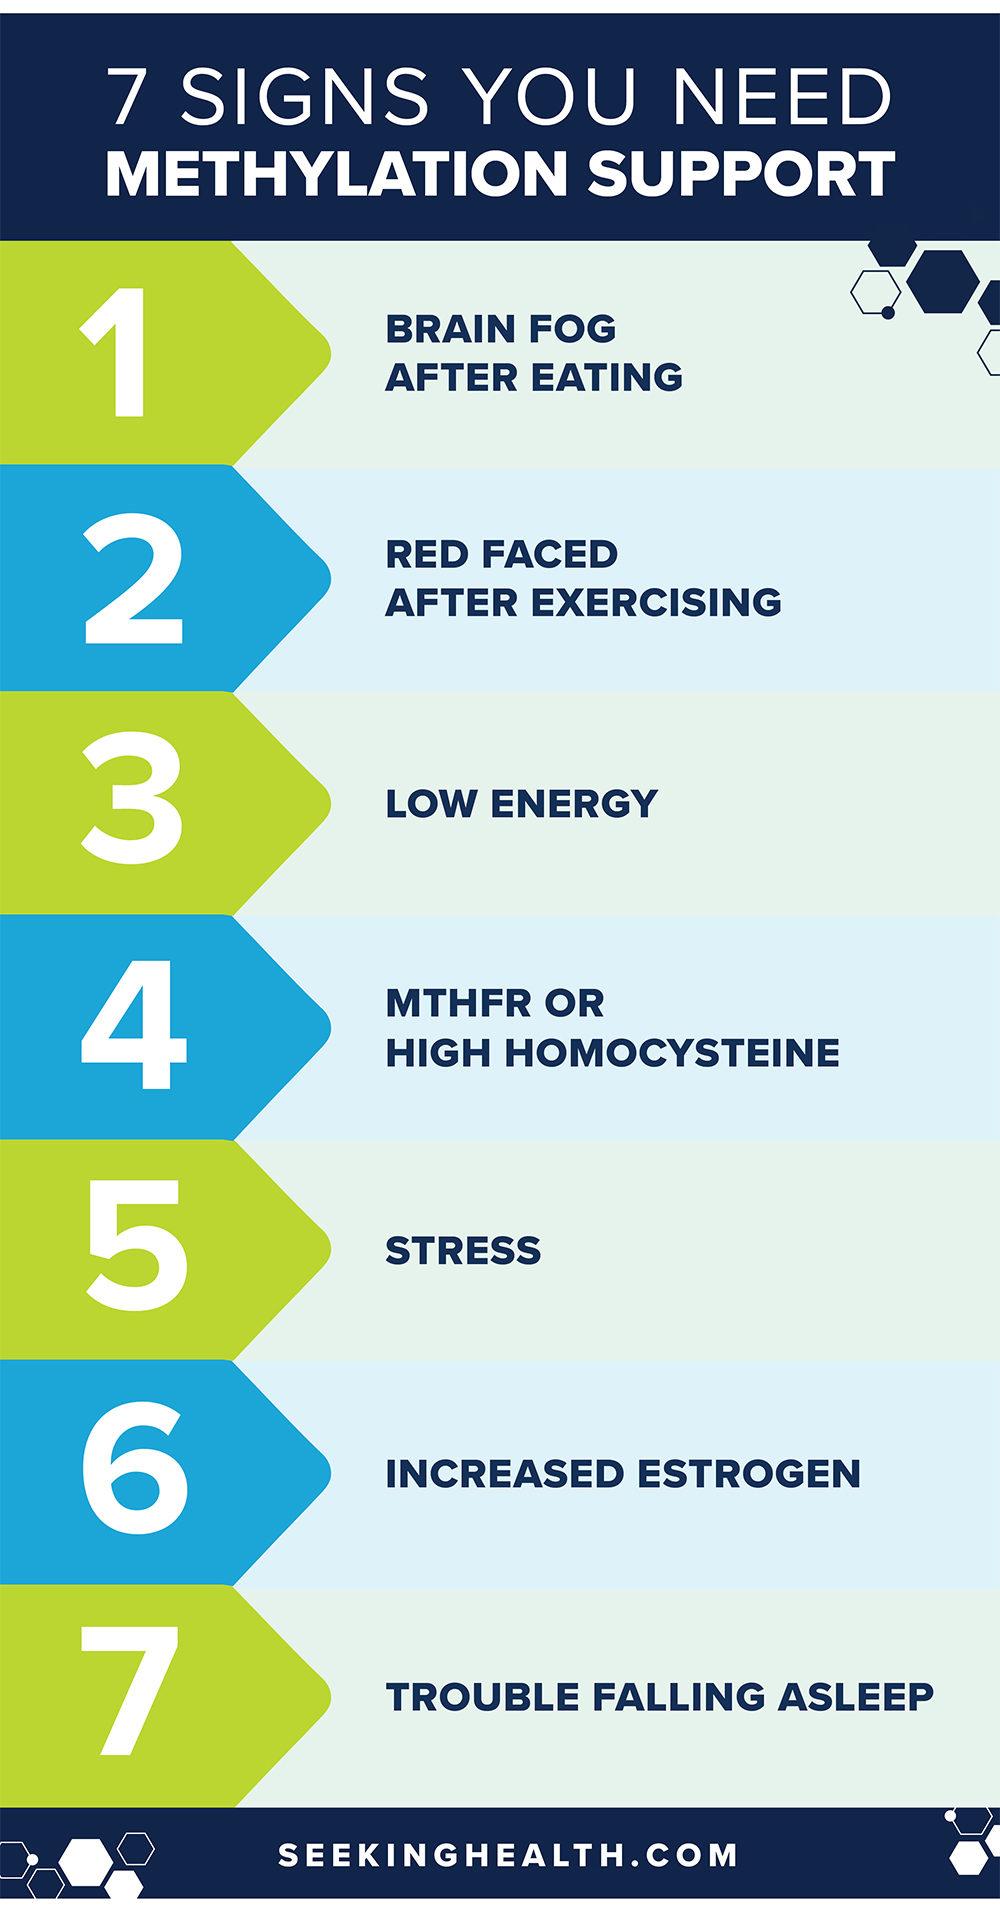 blog-methylation-support-infographic